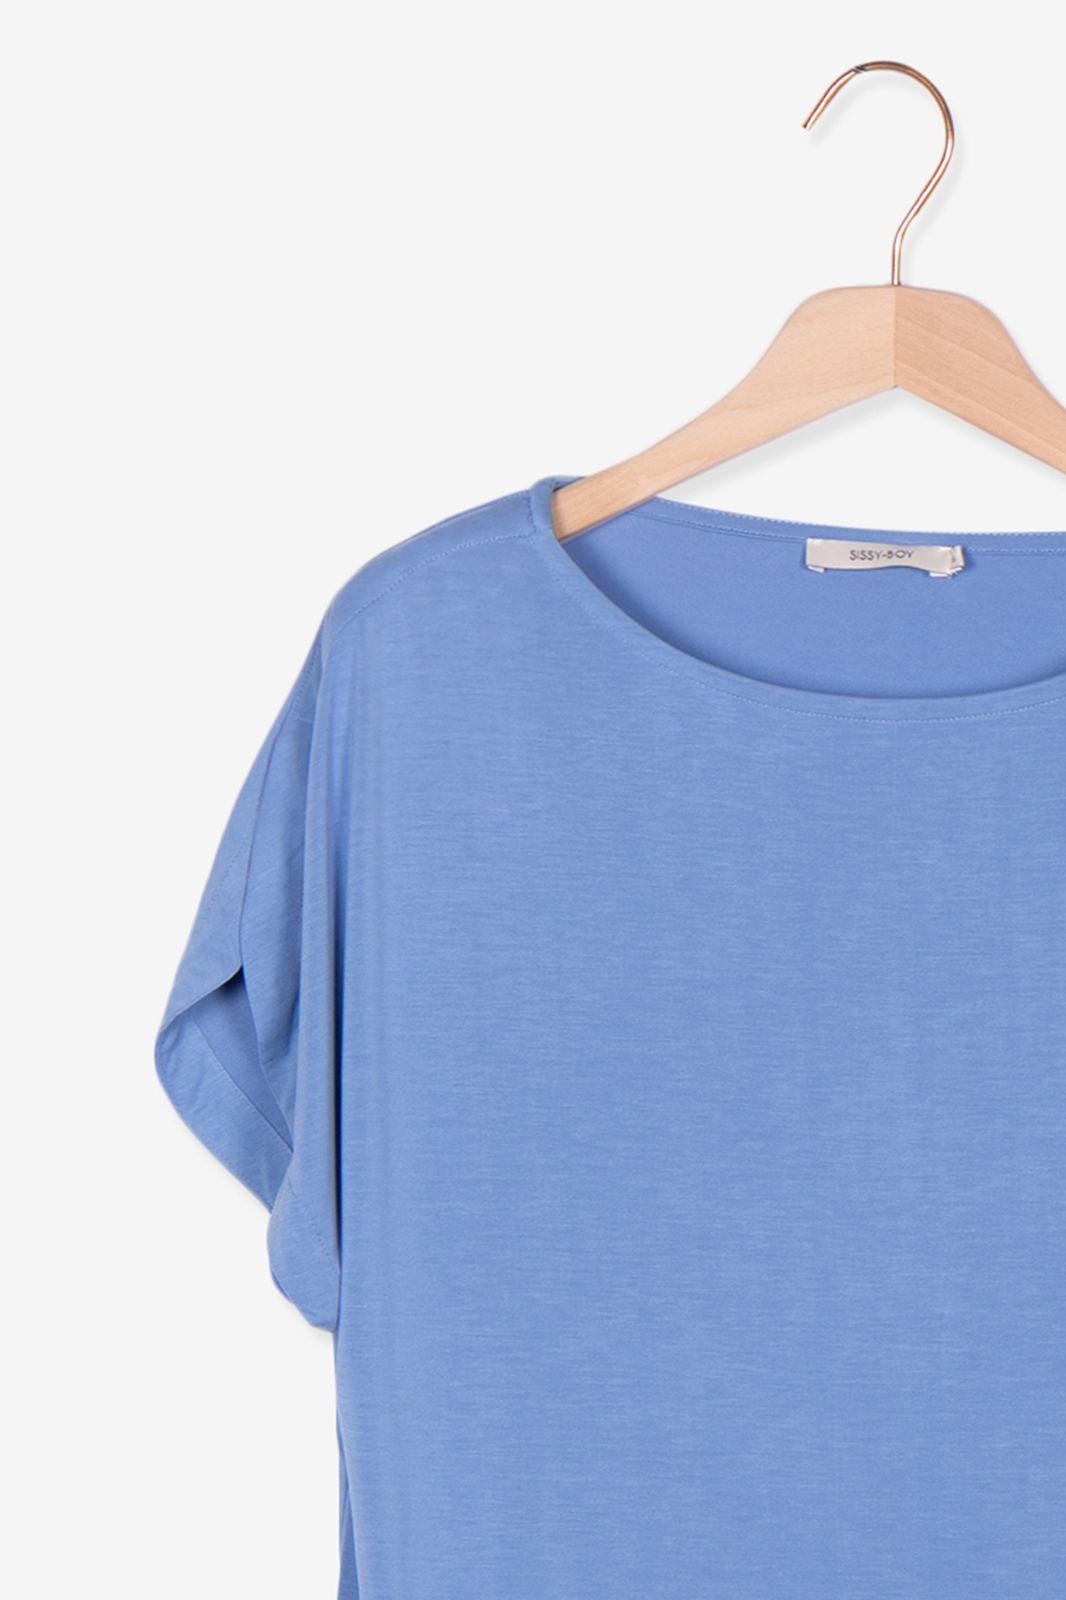 Lichtblauw oversized t-shirt